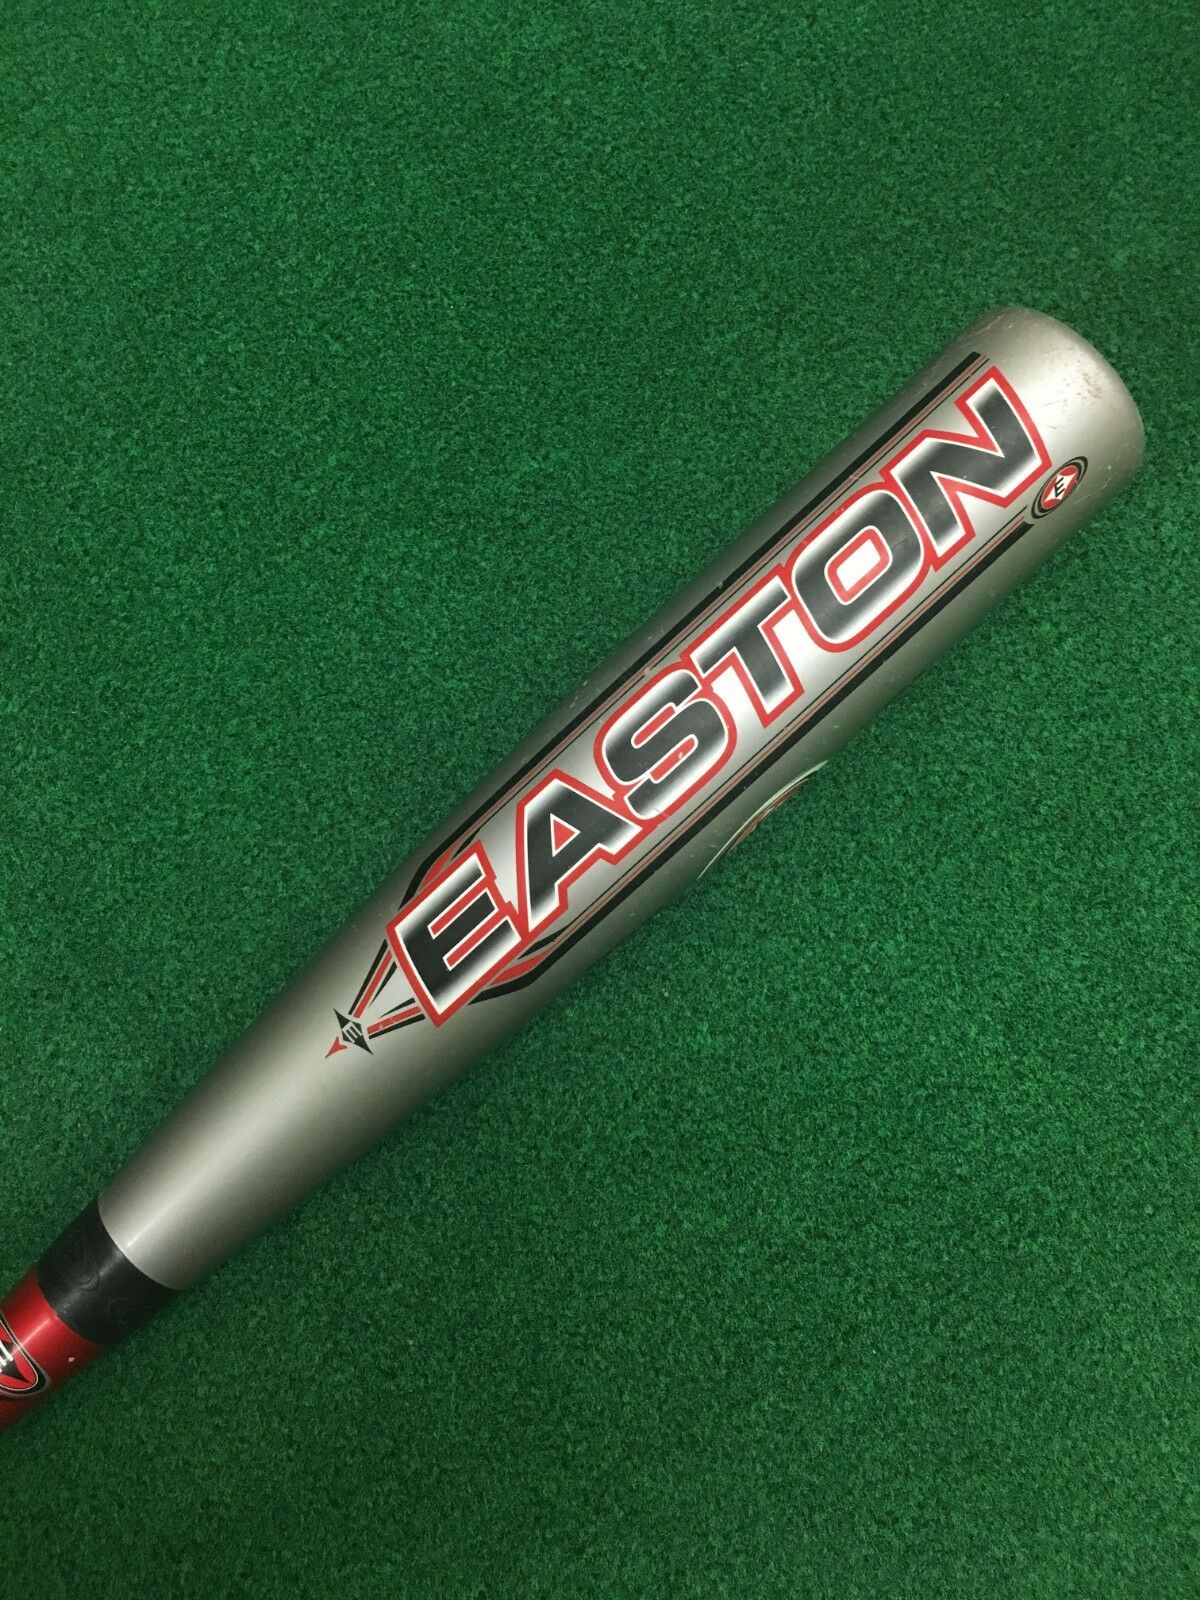 EASTON ROTLINE BT360 BESR -3 BASEBALL BAT 32/29 DROP -3 BESR 2 5/8